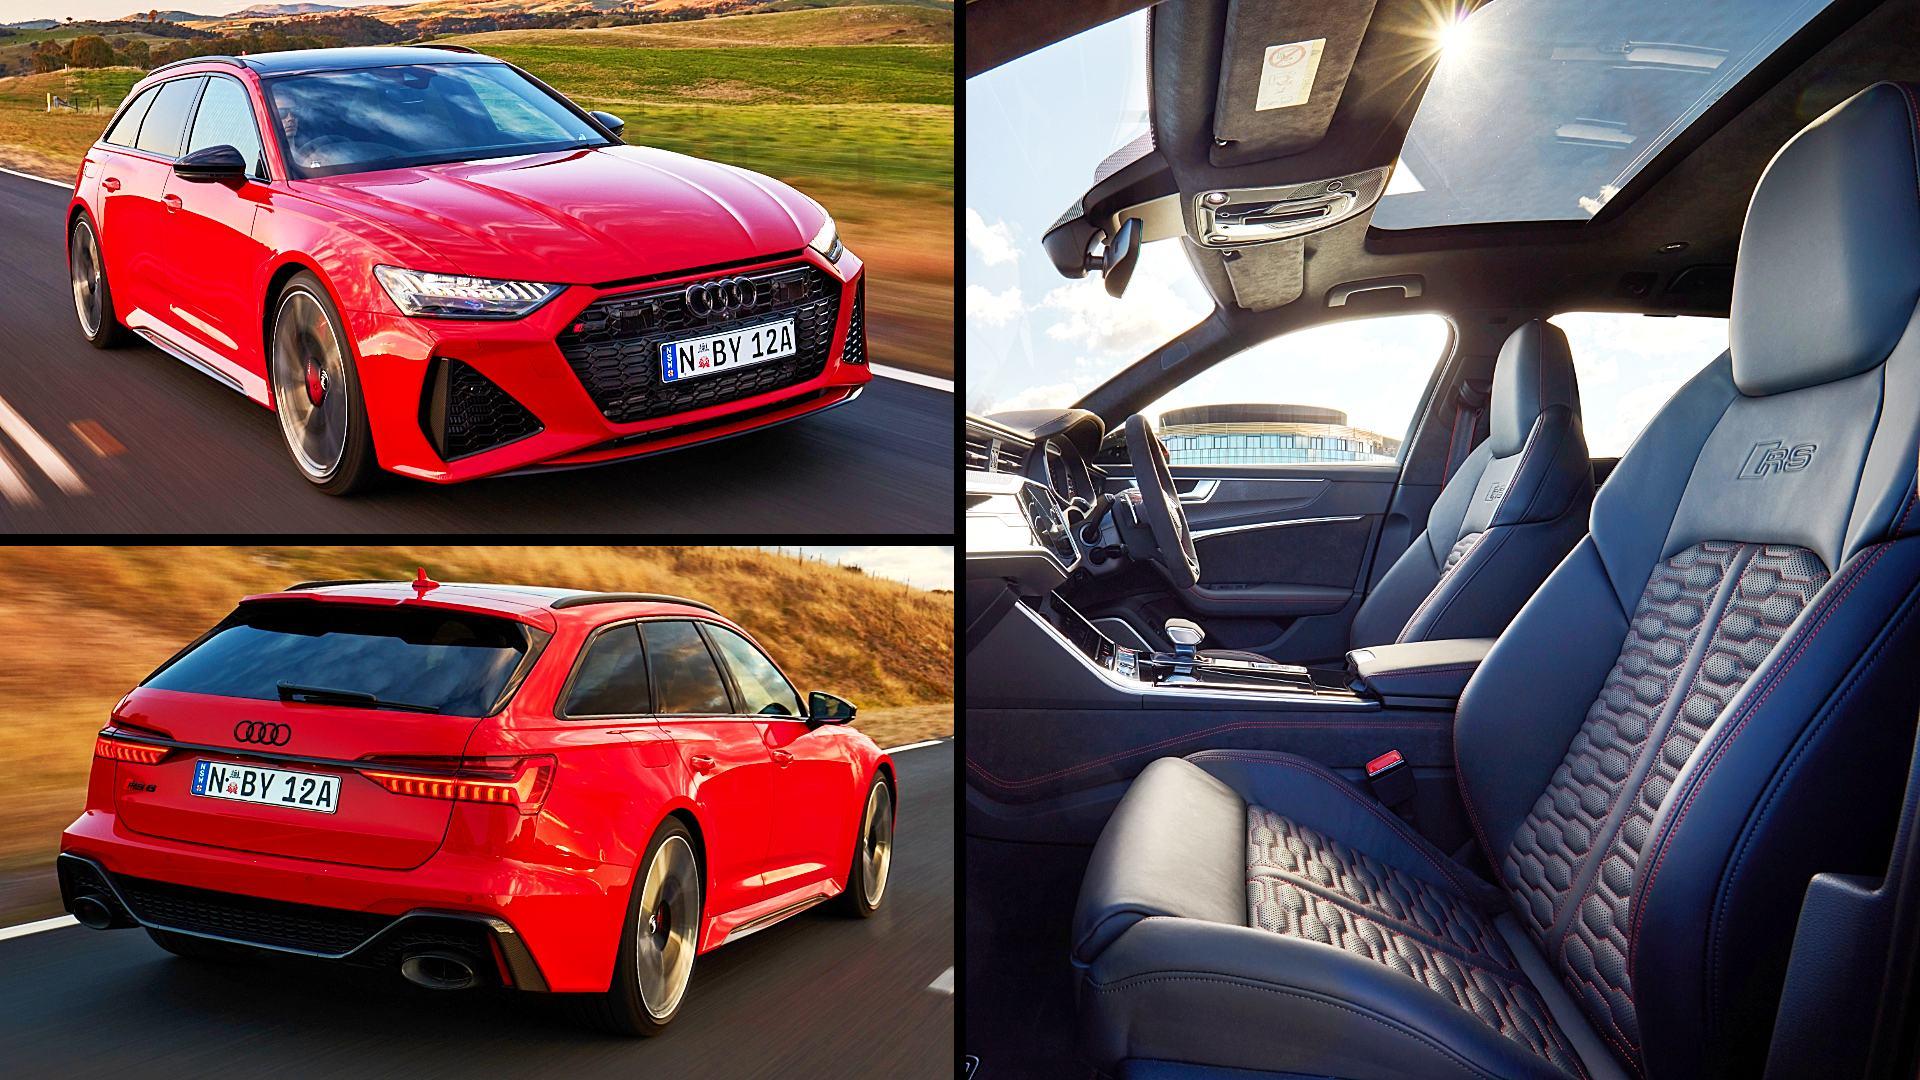 2021 Audi RS6 Avant Red Photos Images